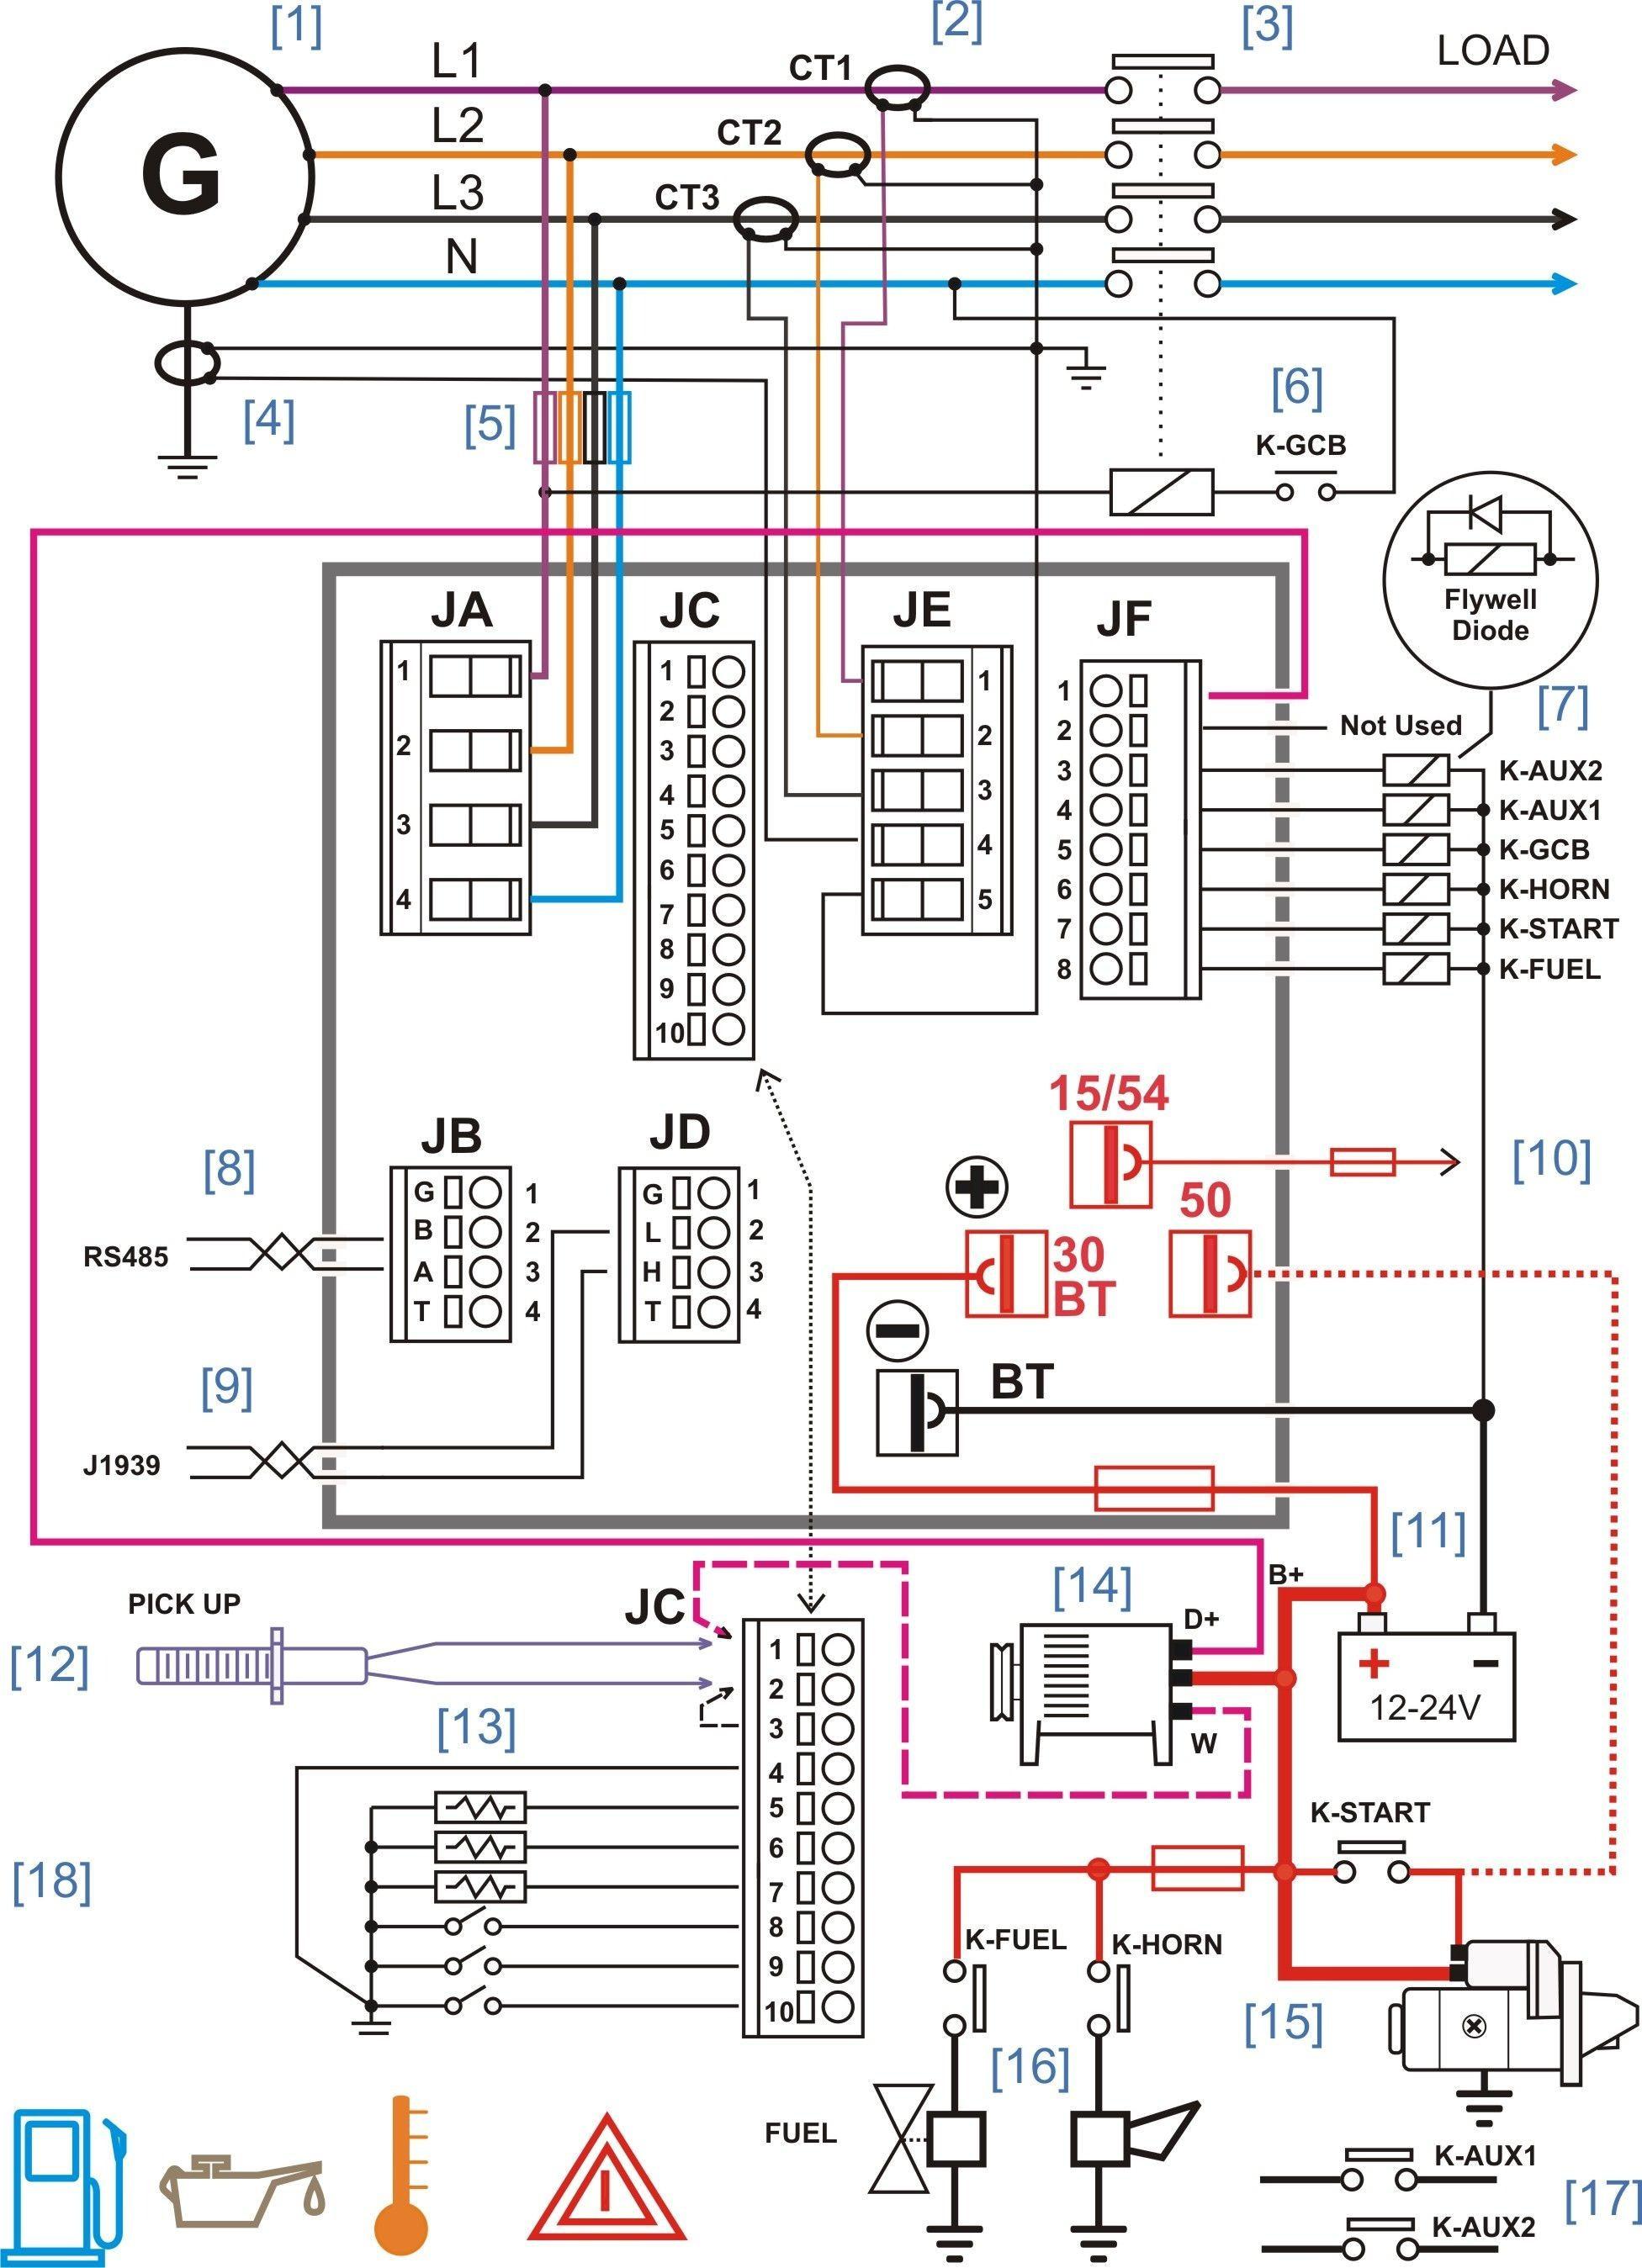 home wiring diagram tool 1so lektionenderliebe de u2022 rh 1so lektionenderliebe de home wiring diagram software download